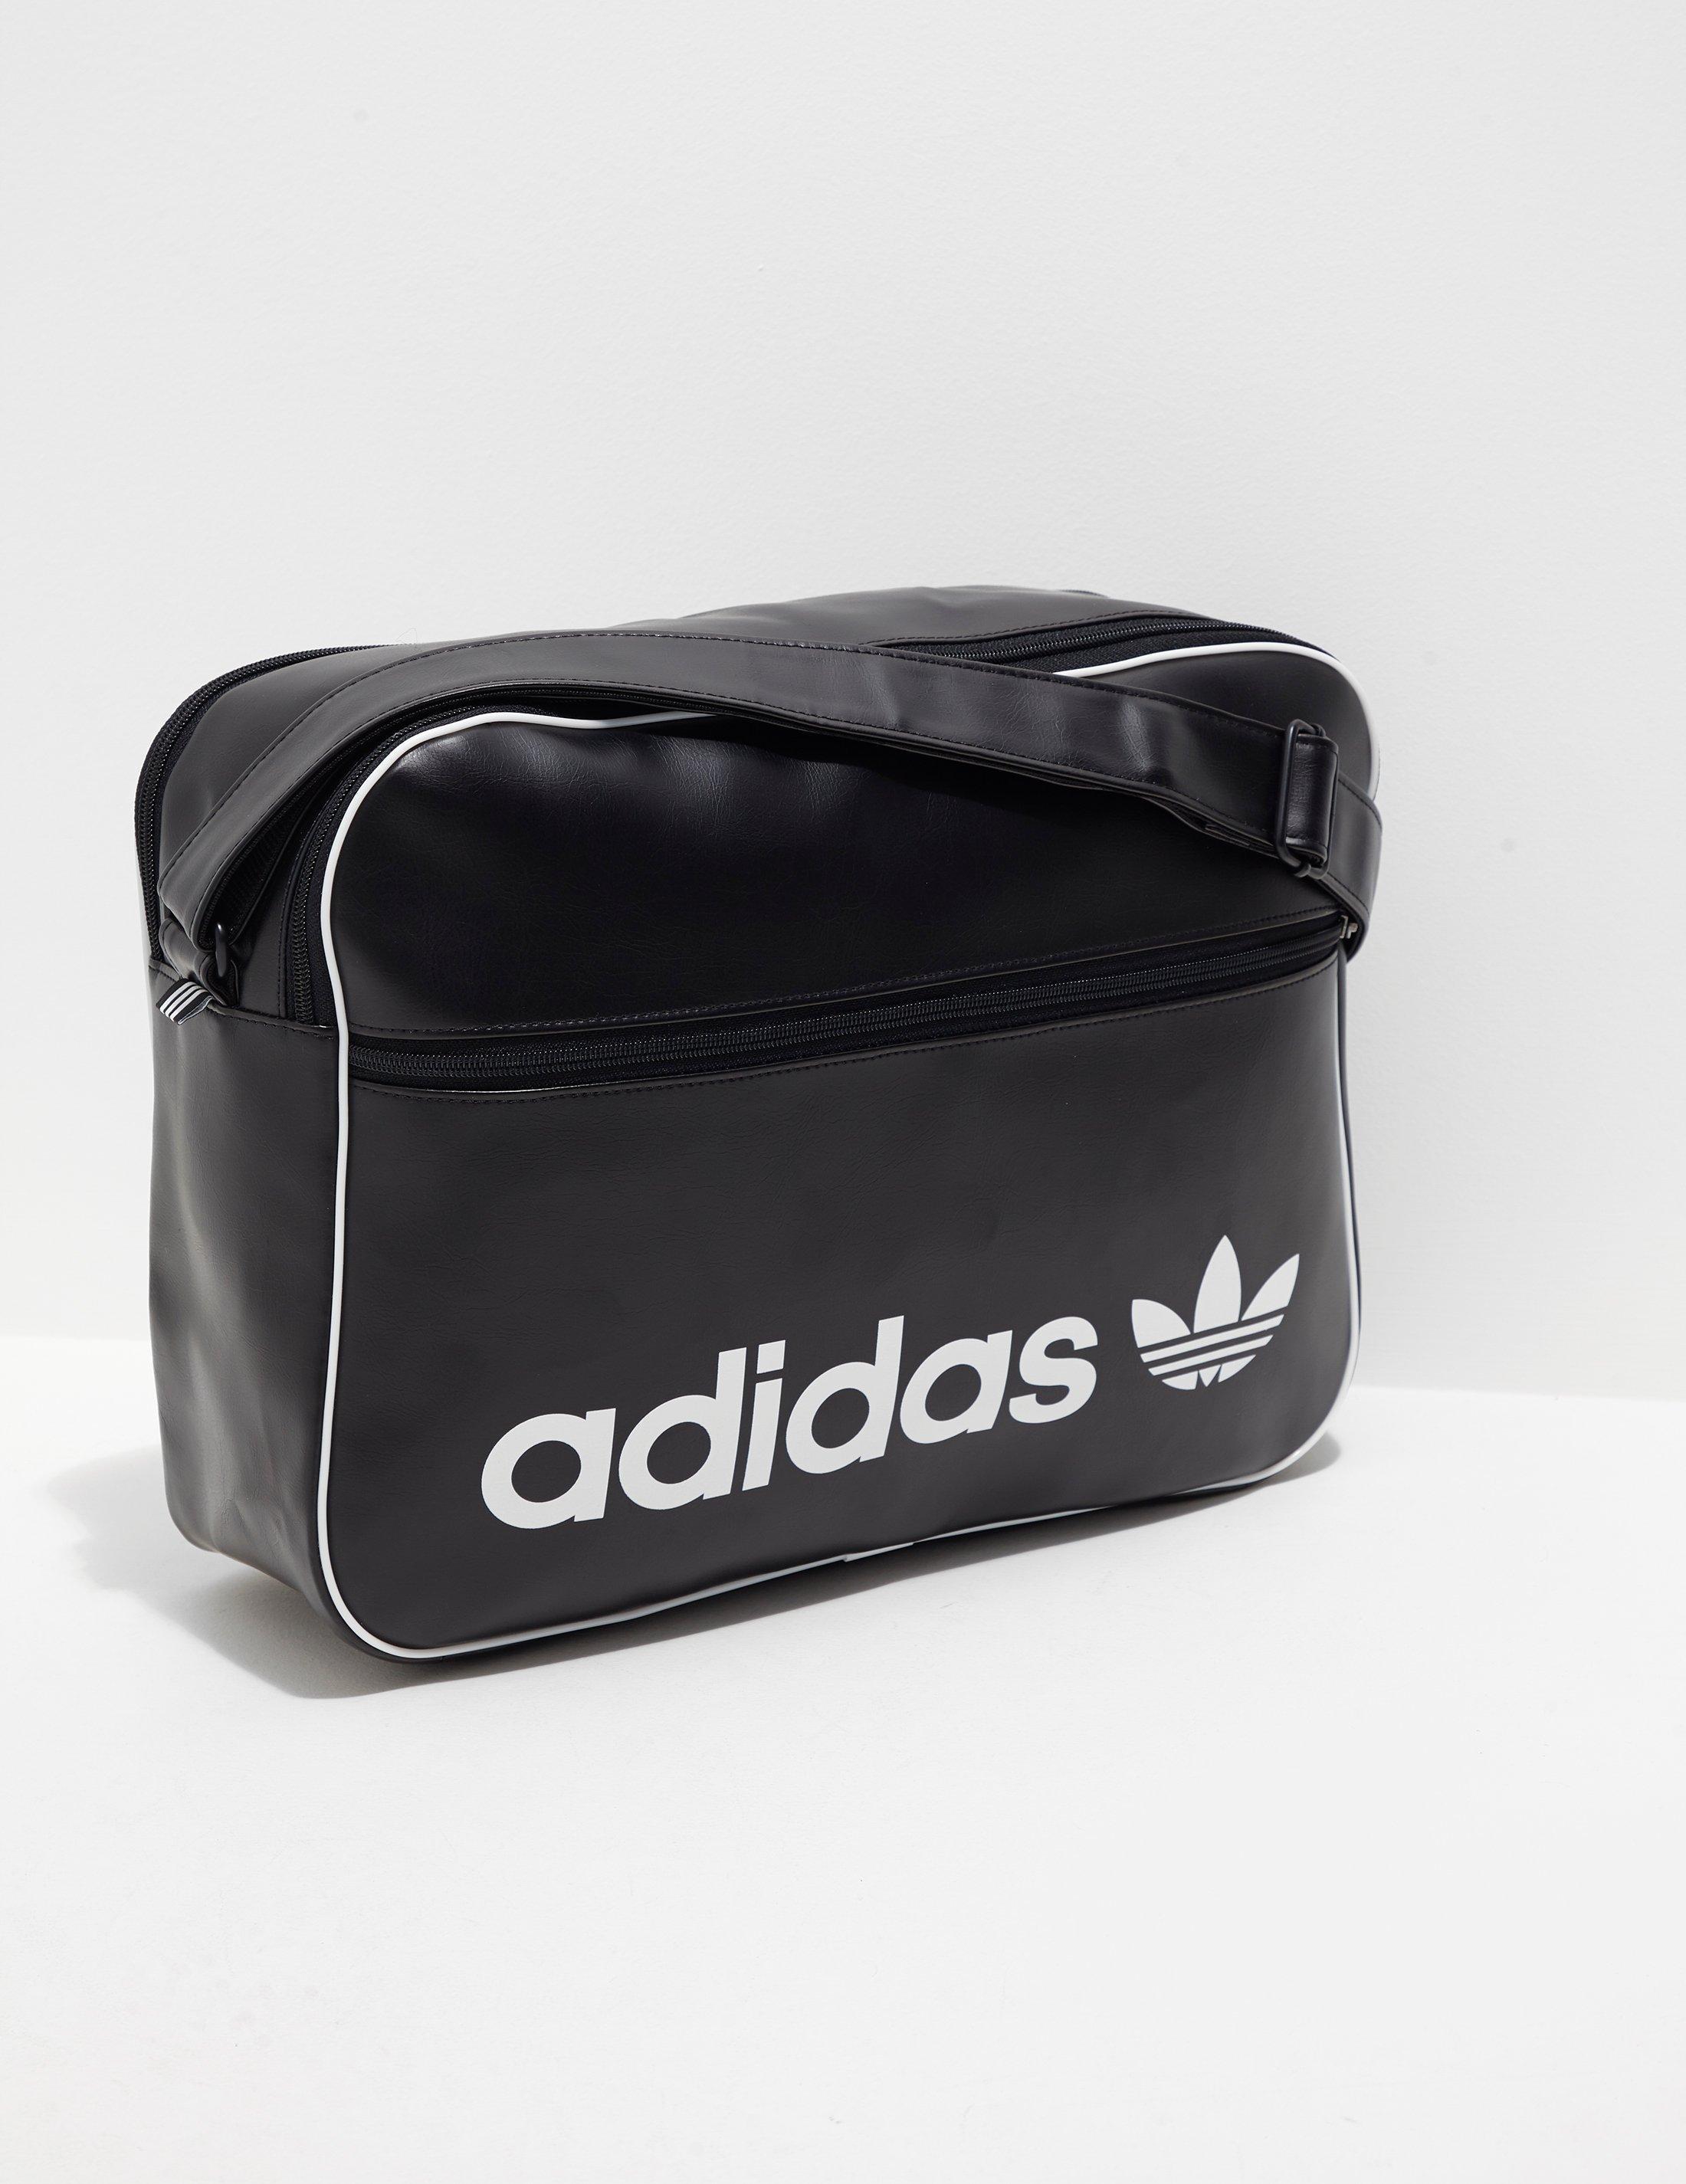 d7985fd3807a Adidas Originals Mens Airliner Bag Black white in Black - Lyst